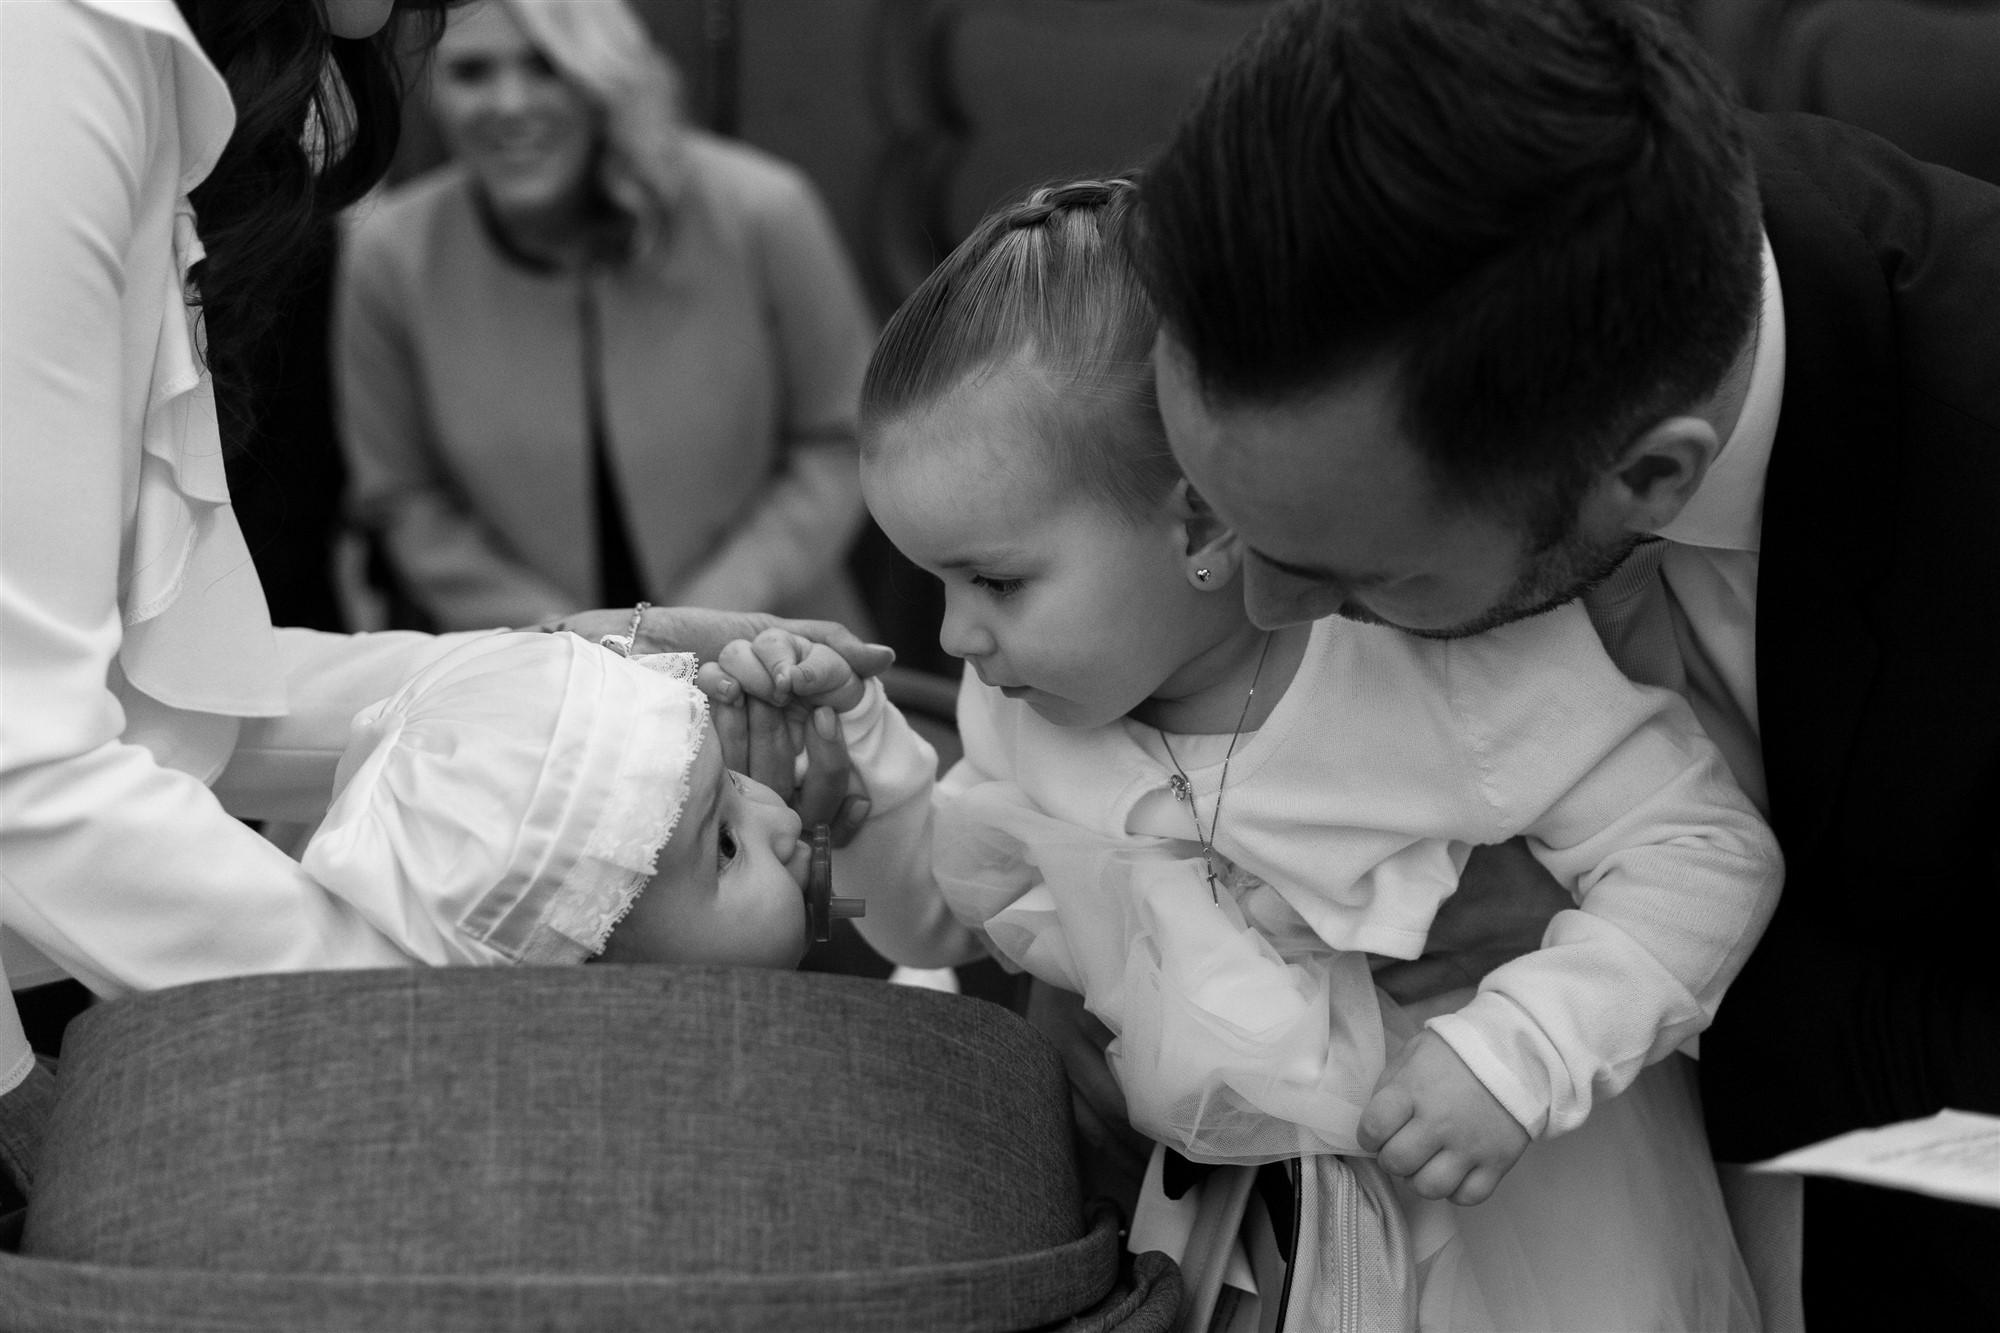 Die grosse Schwester segnet das Taufbaby